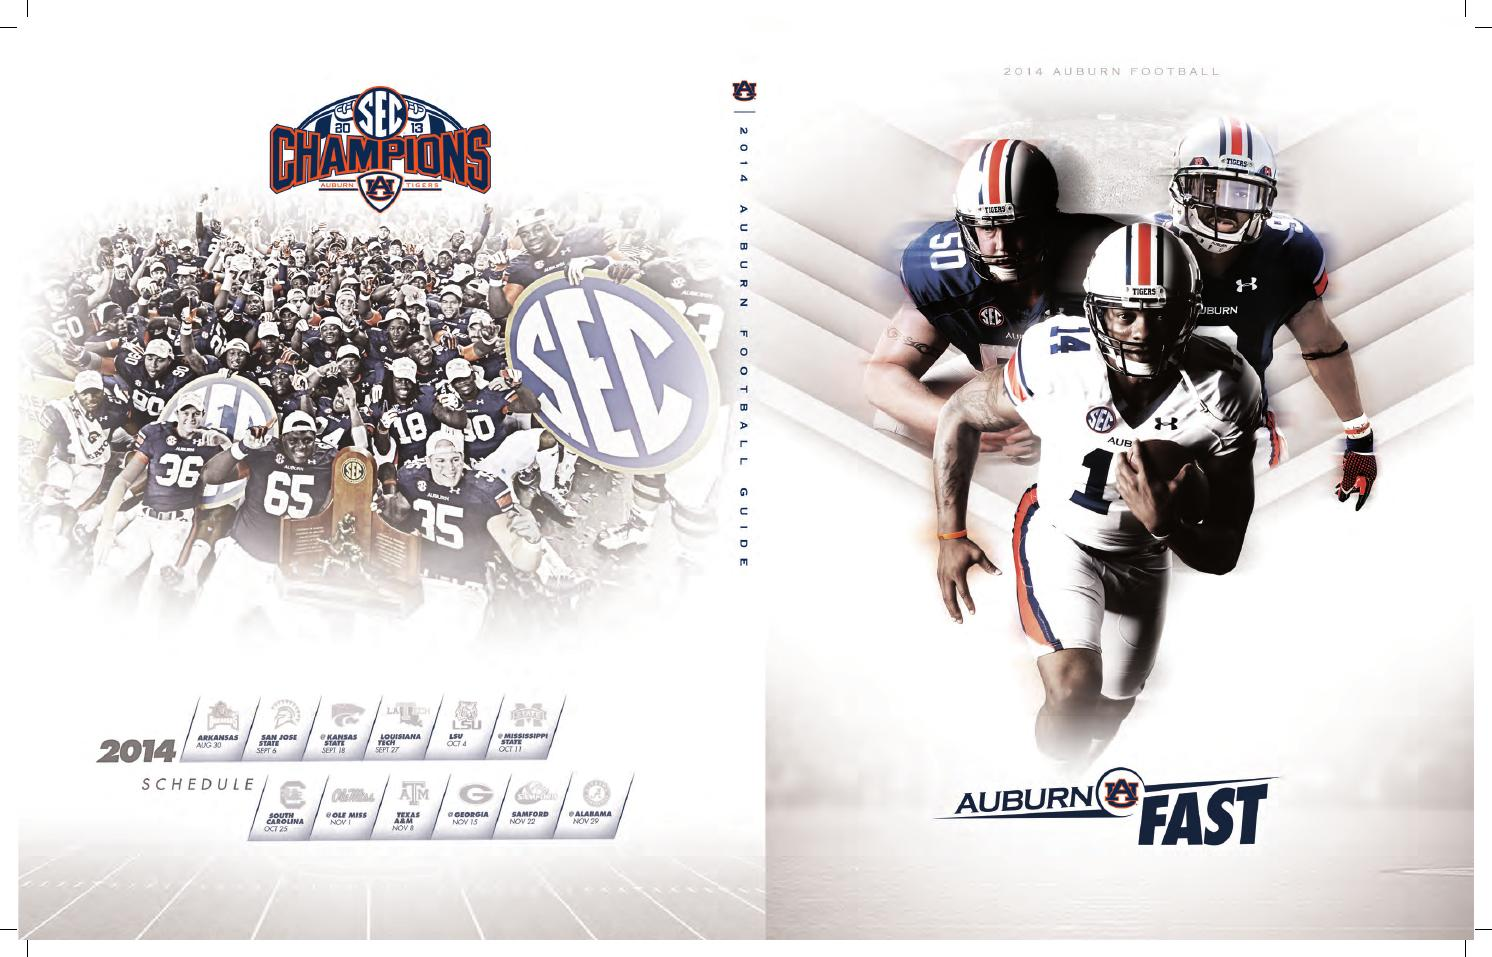 2014 Auburn Football Guide by Auburn Athletics Department